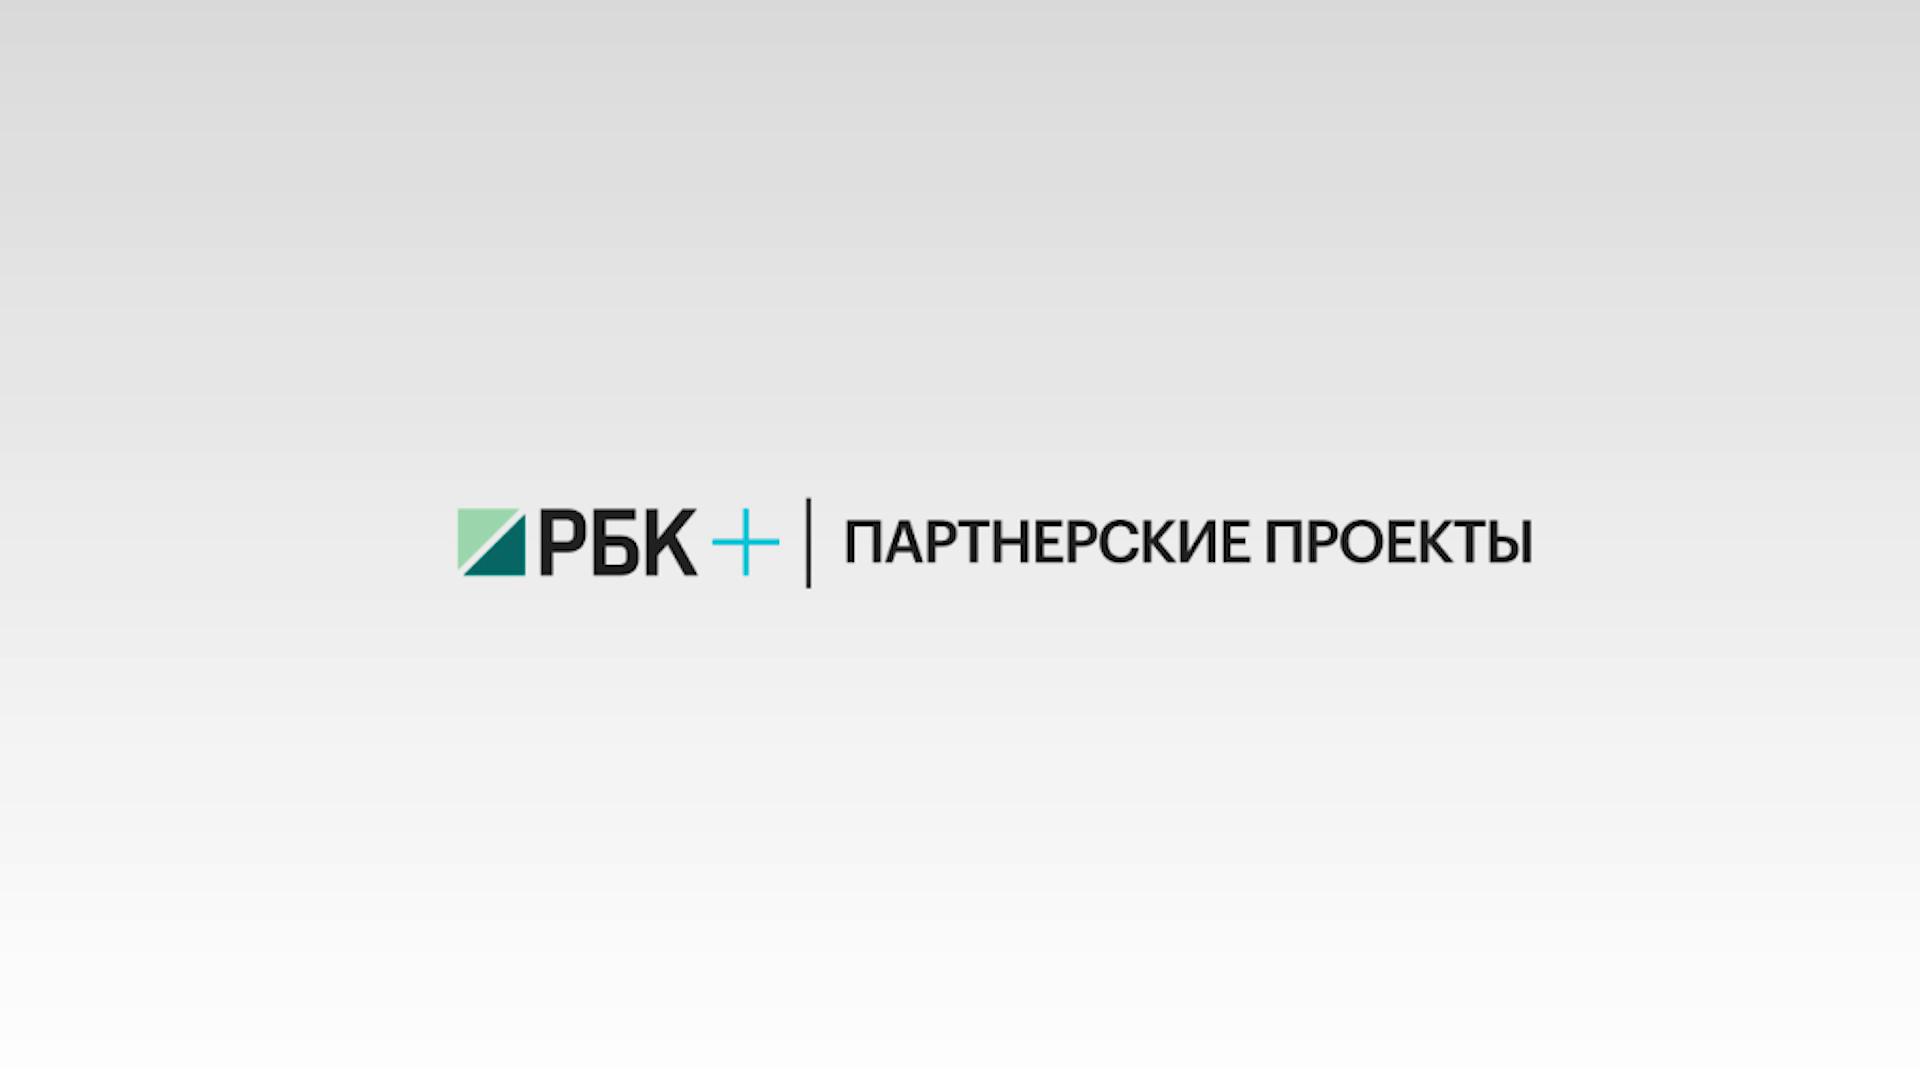 Programme: РБК+ / Территория развития